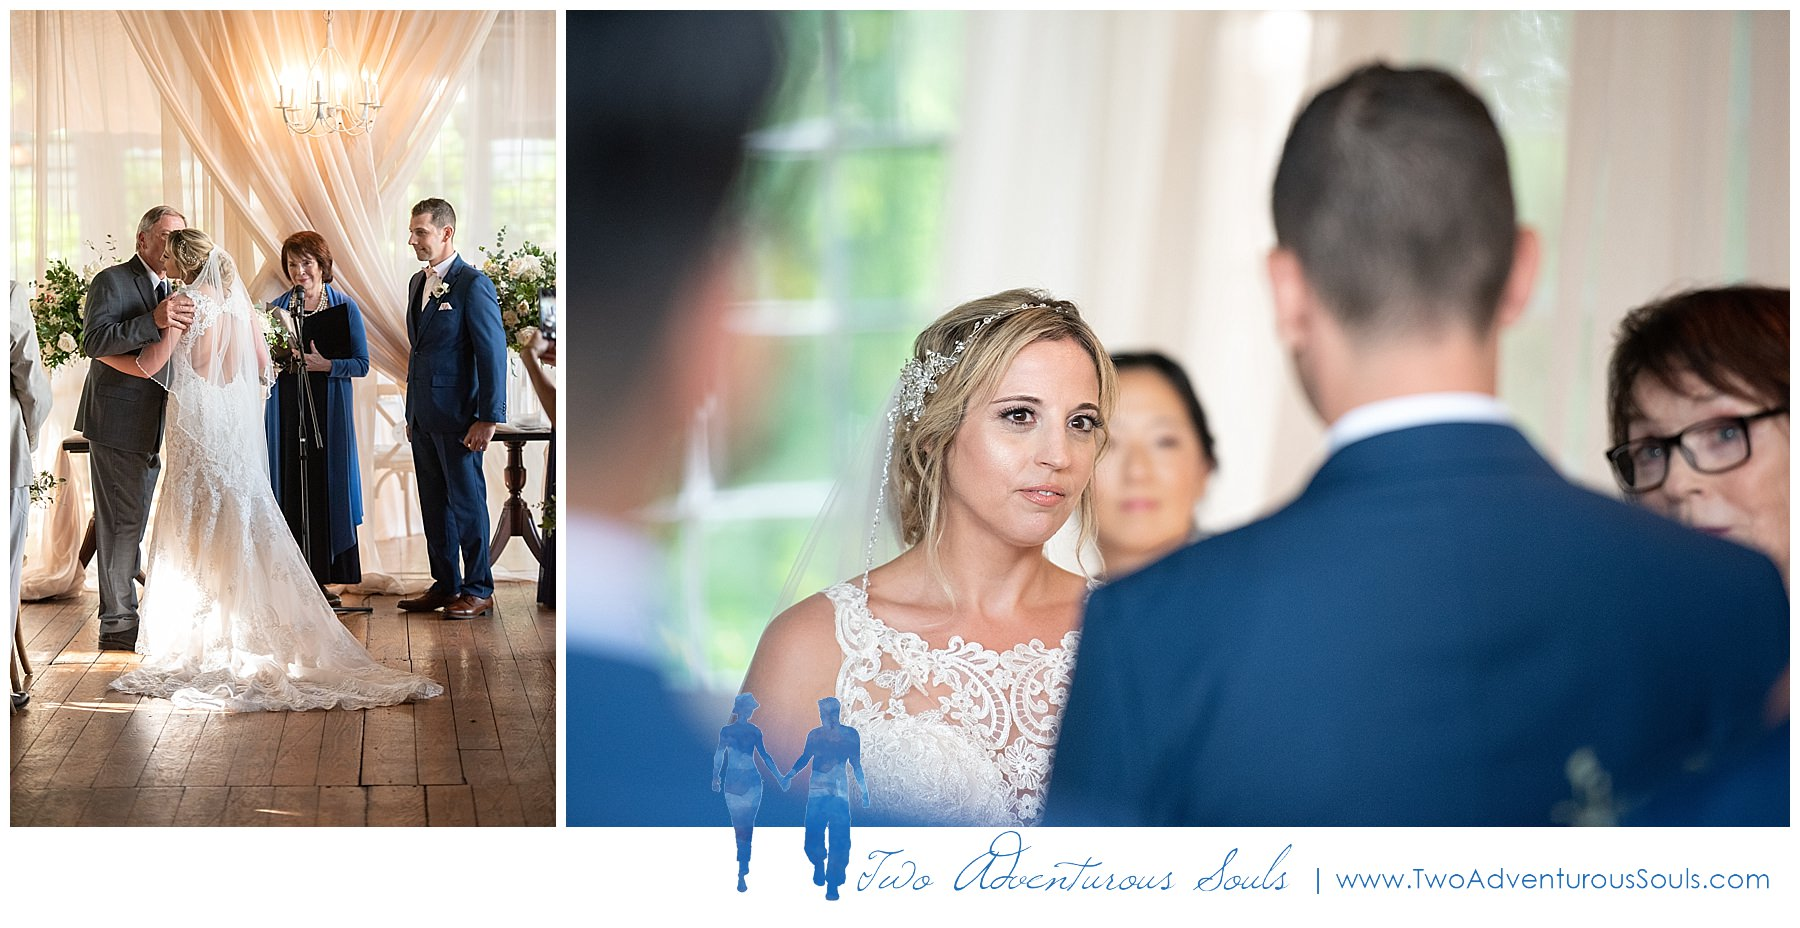 Connecticut Wedding Photographers, Lace Factory Wedding Photographers, Two Adventurous Souls - 083119_0035.jpg